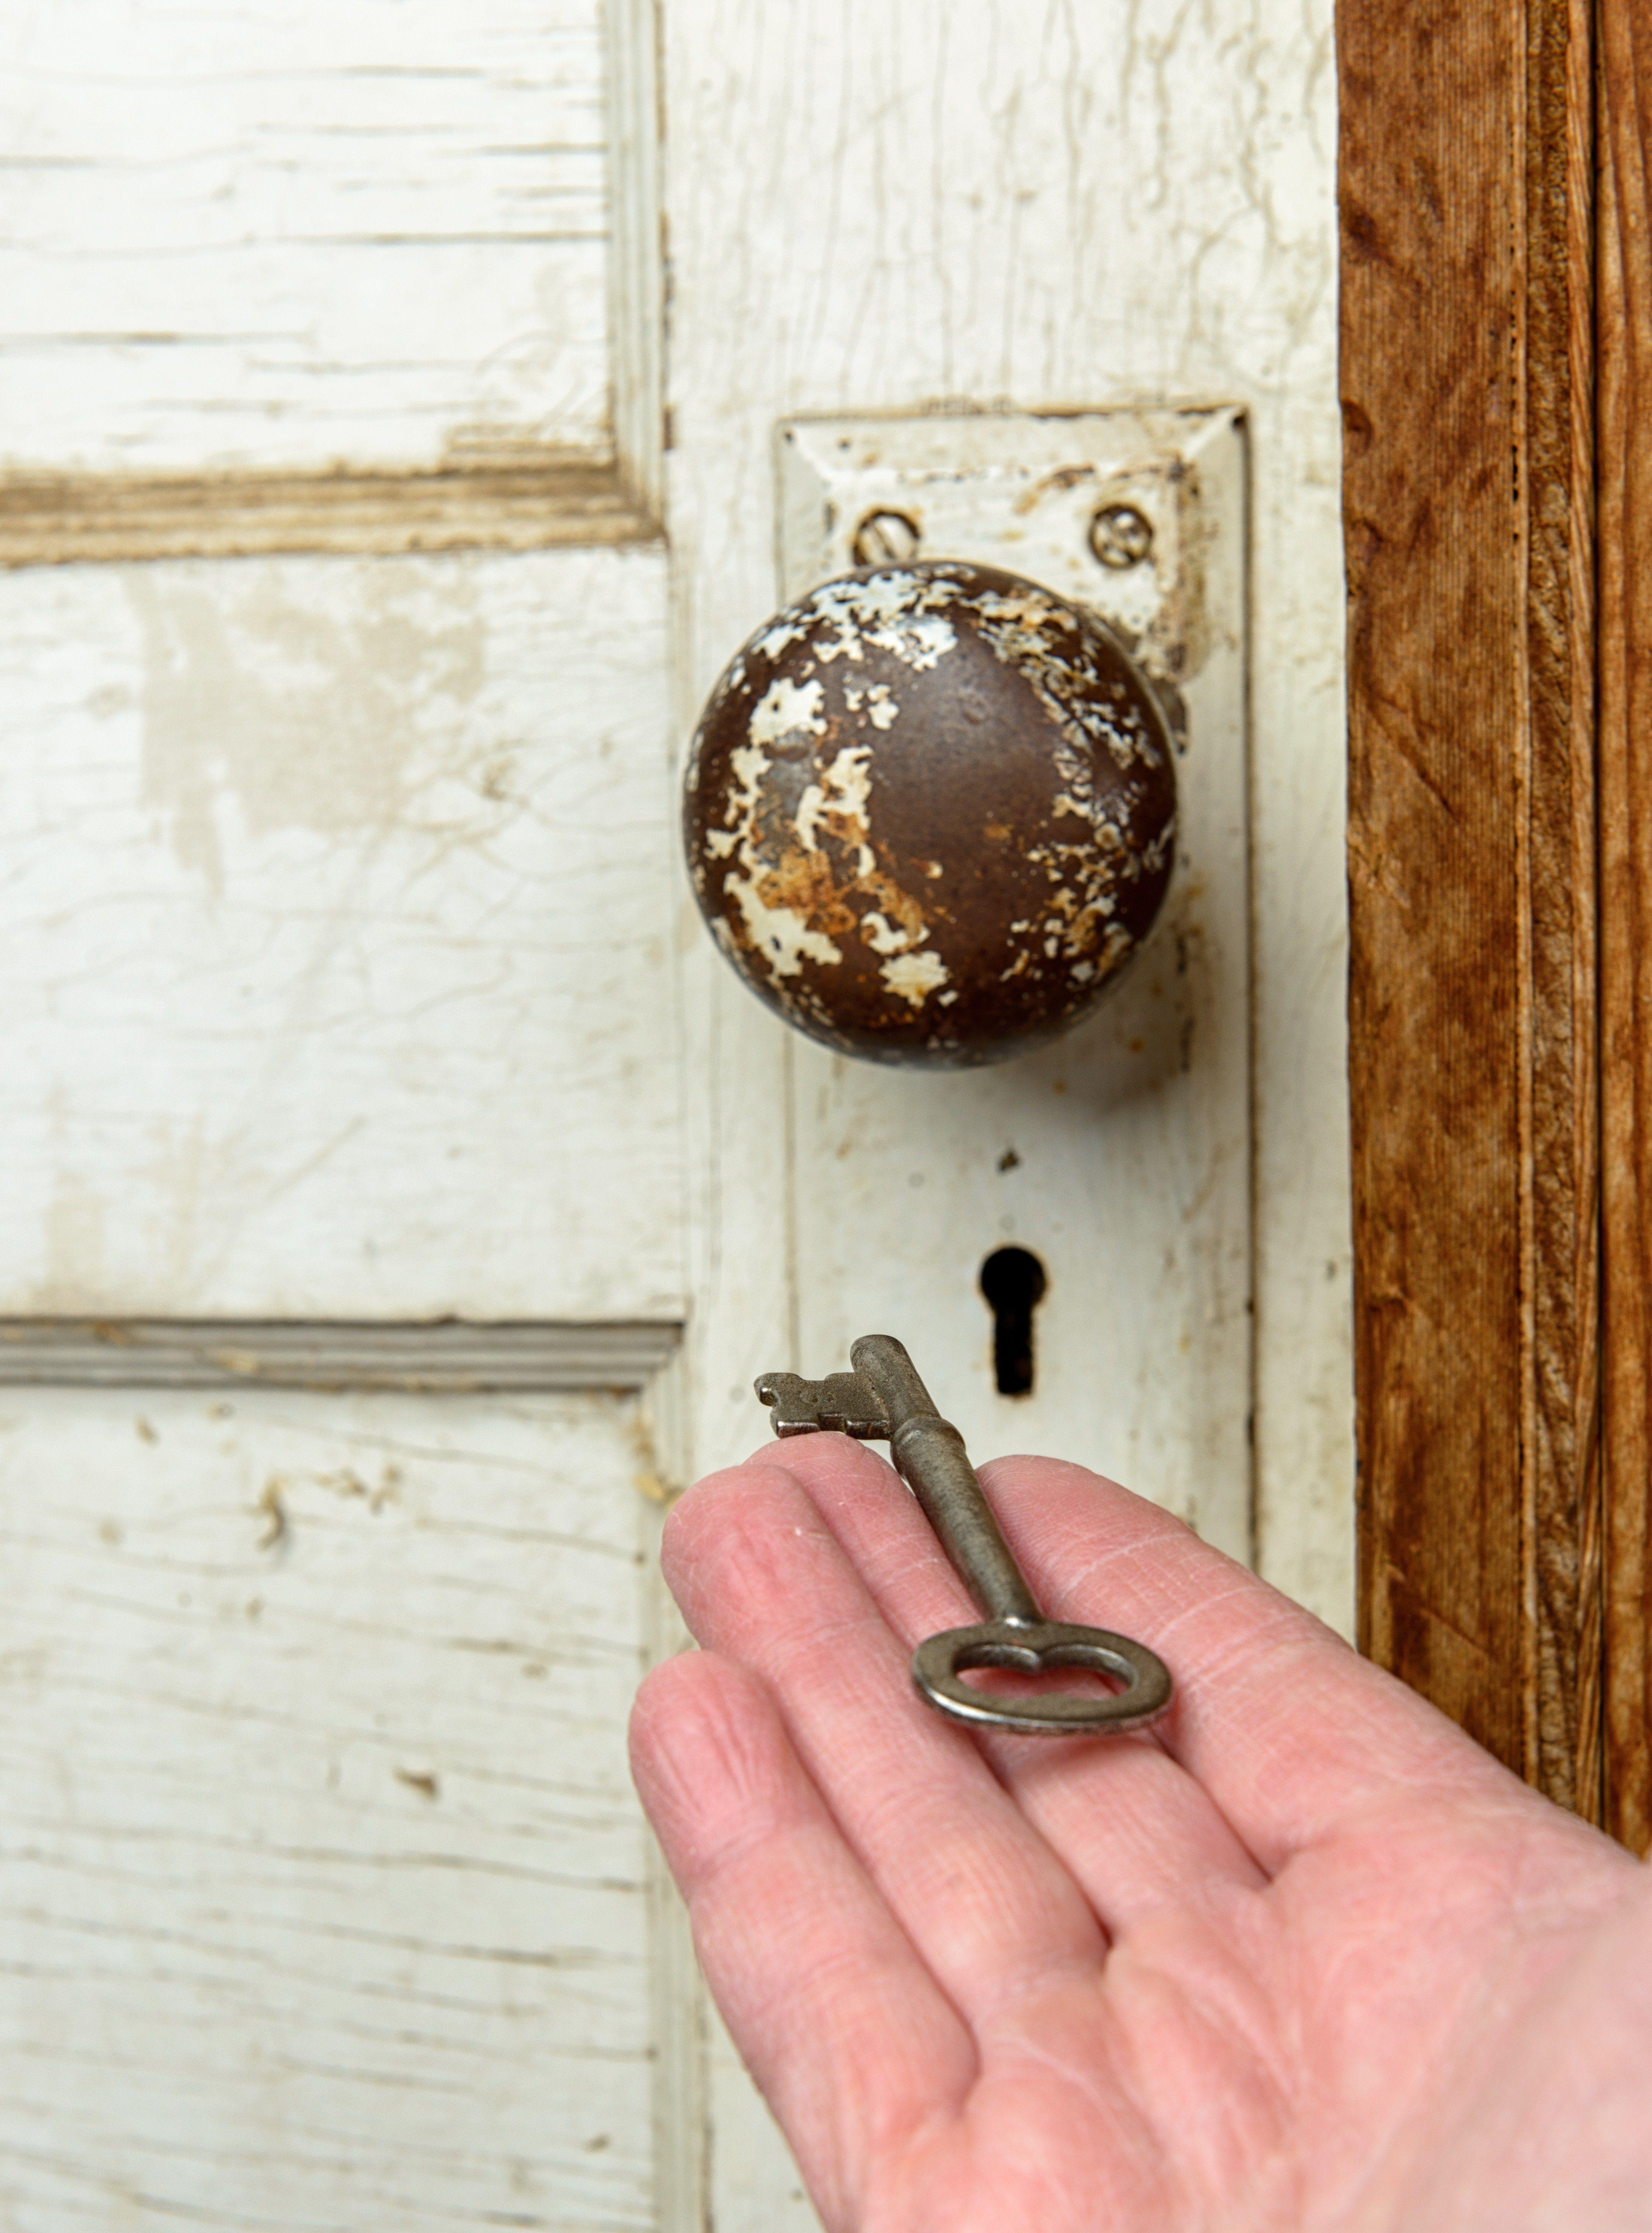 Lock and key.